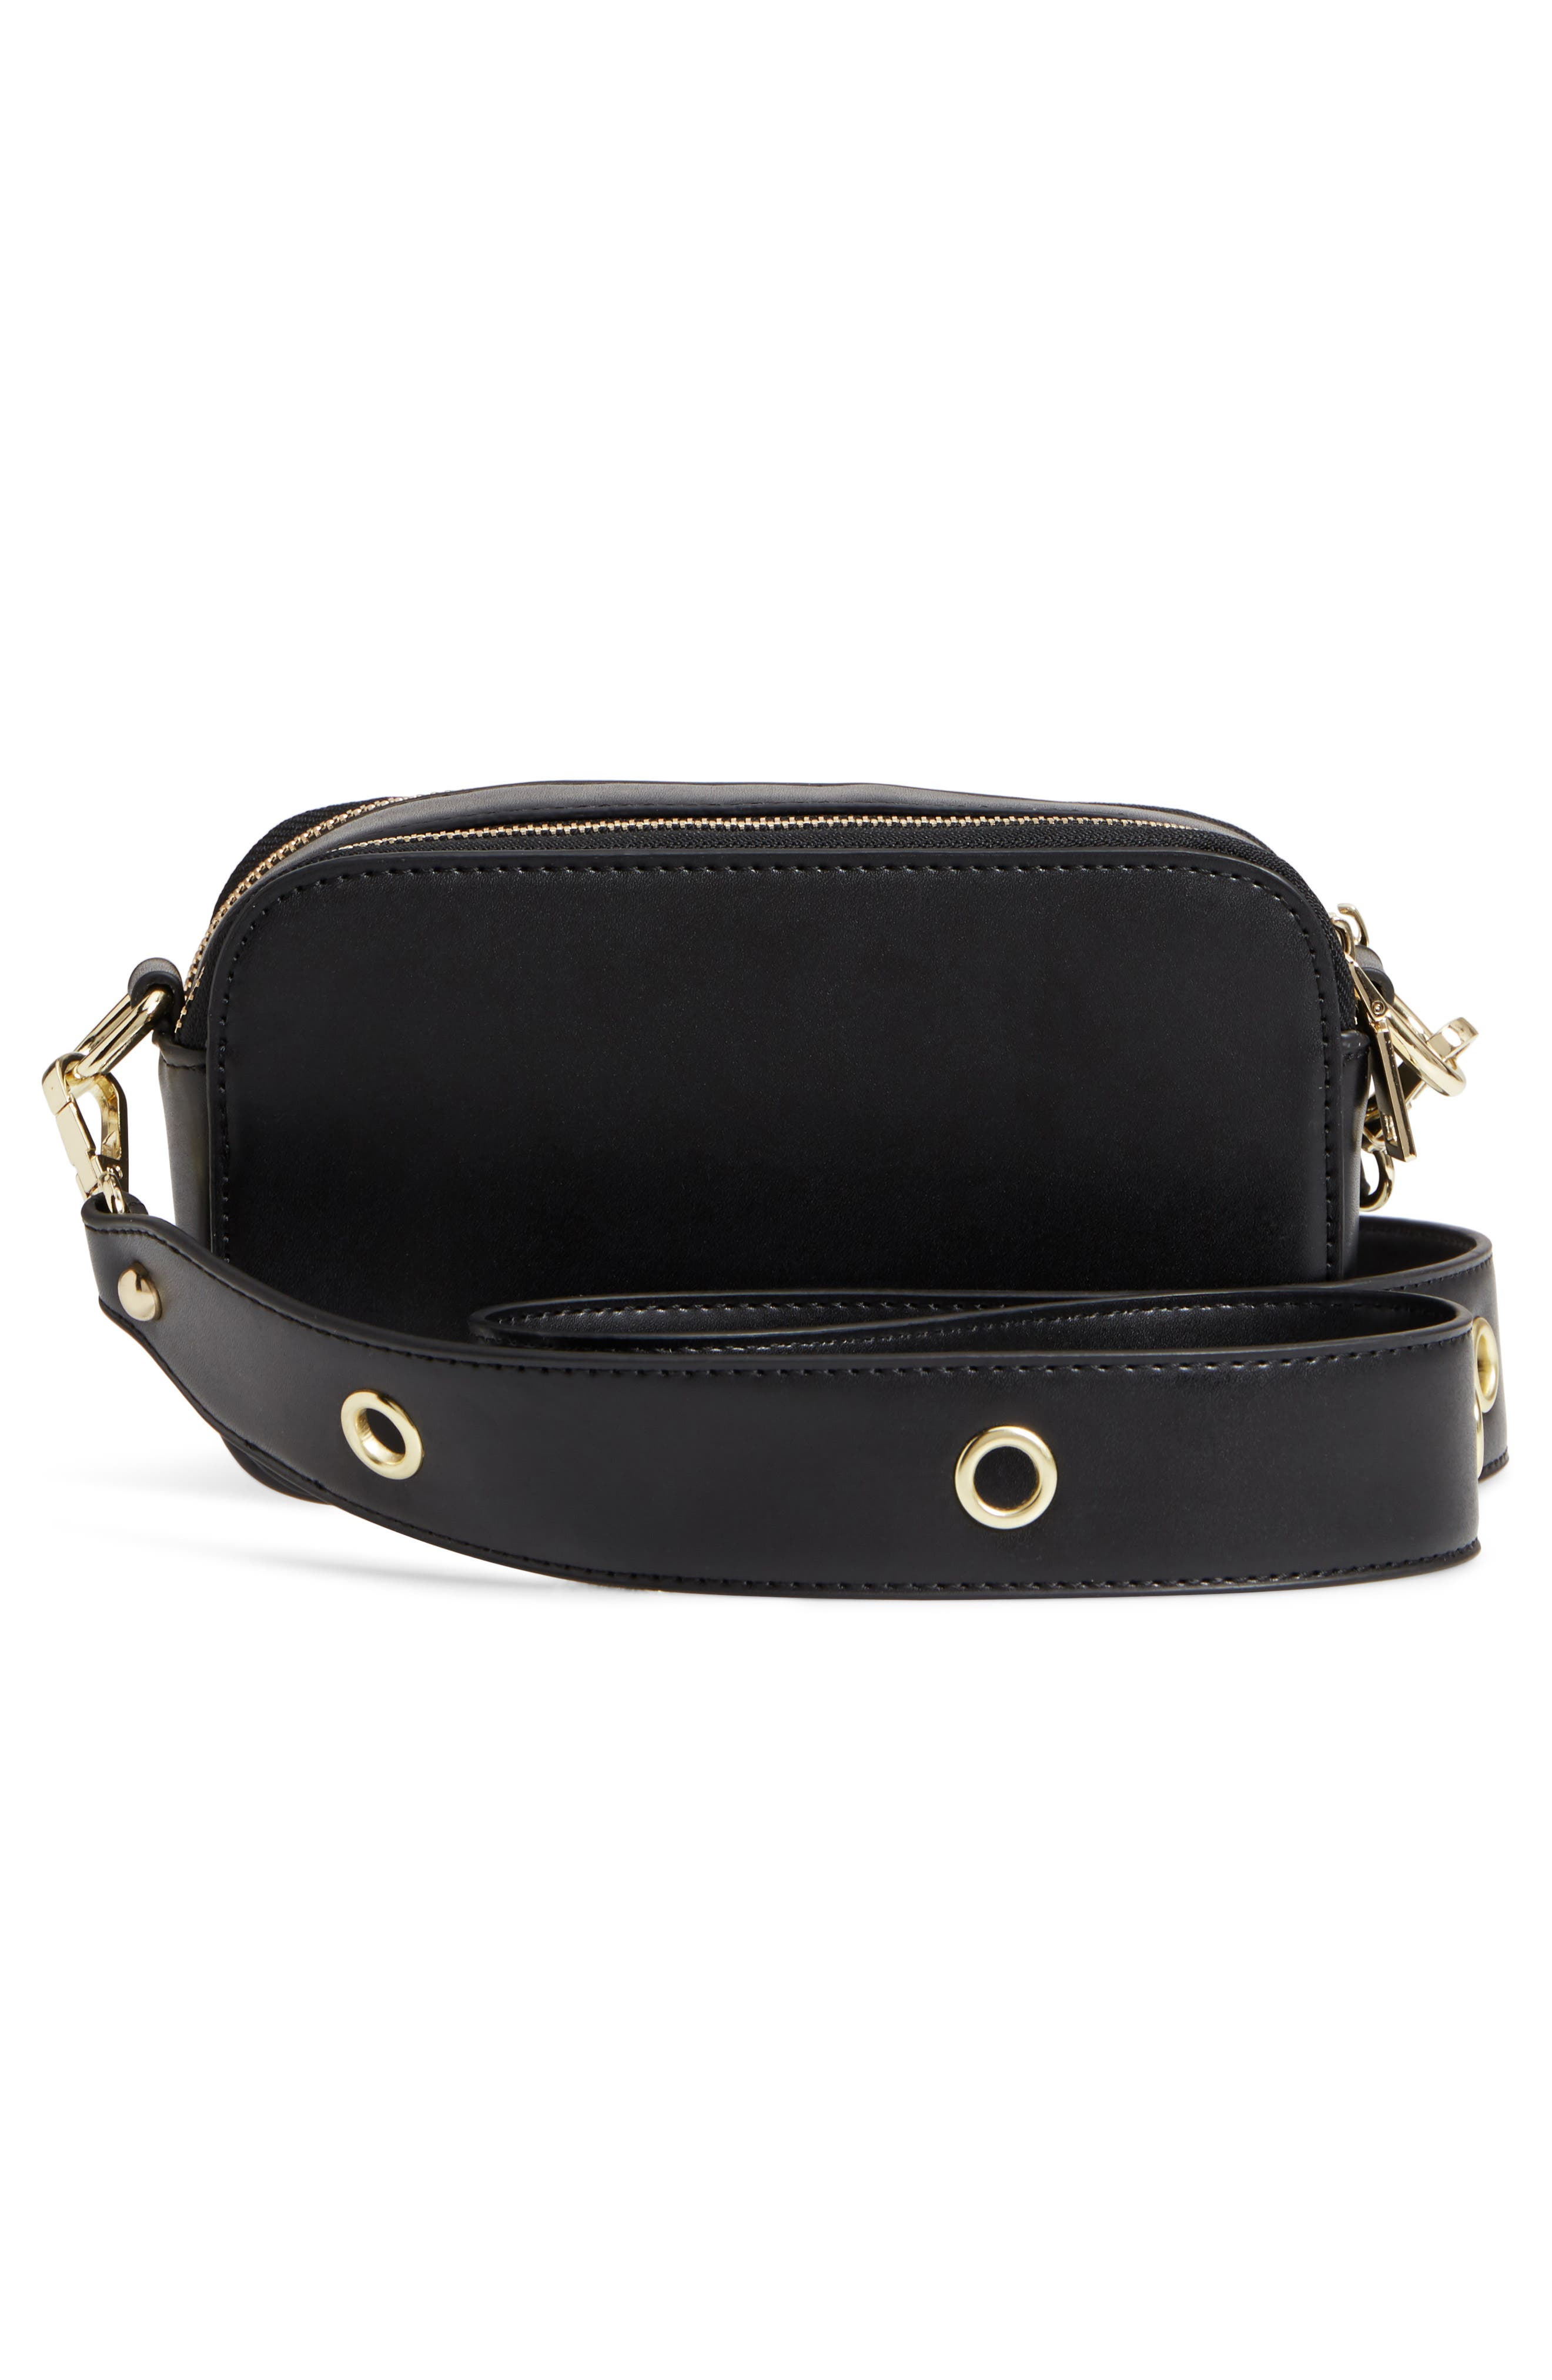 Dyana Grommet Faux Leather Crossbody Bag,                             Alternate thumbnail 3, color,                             Black